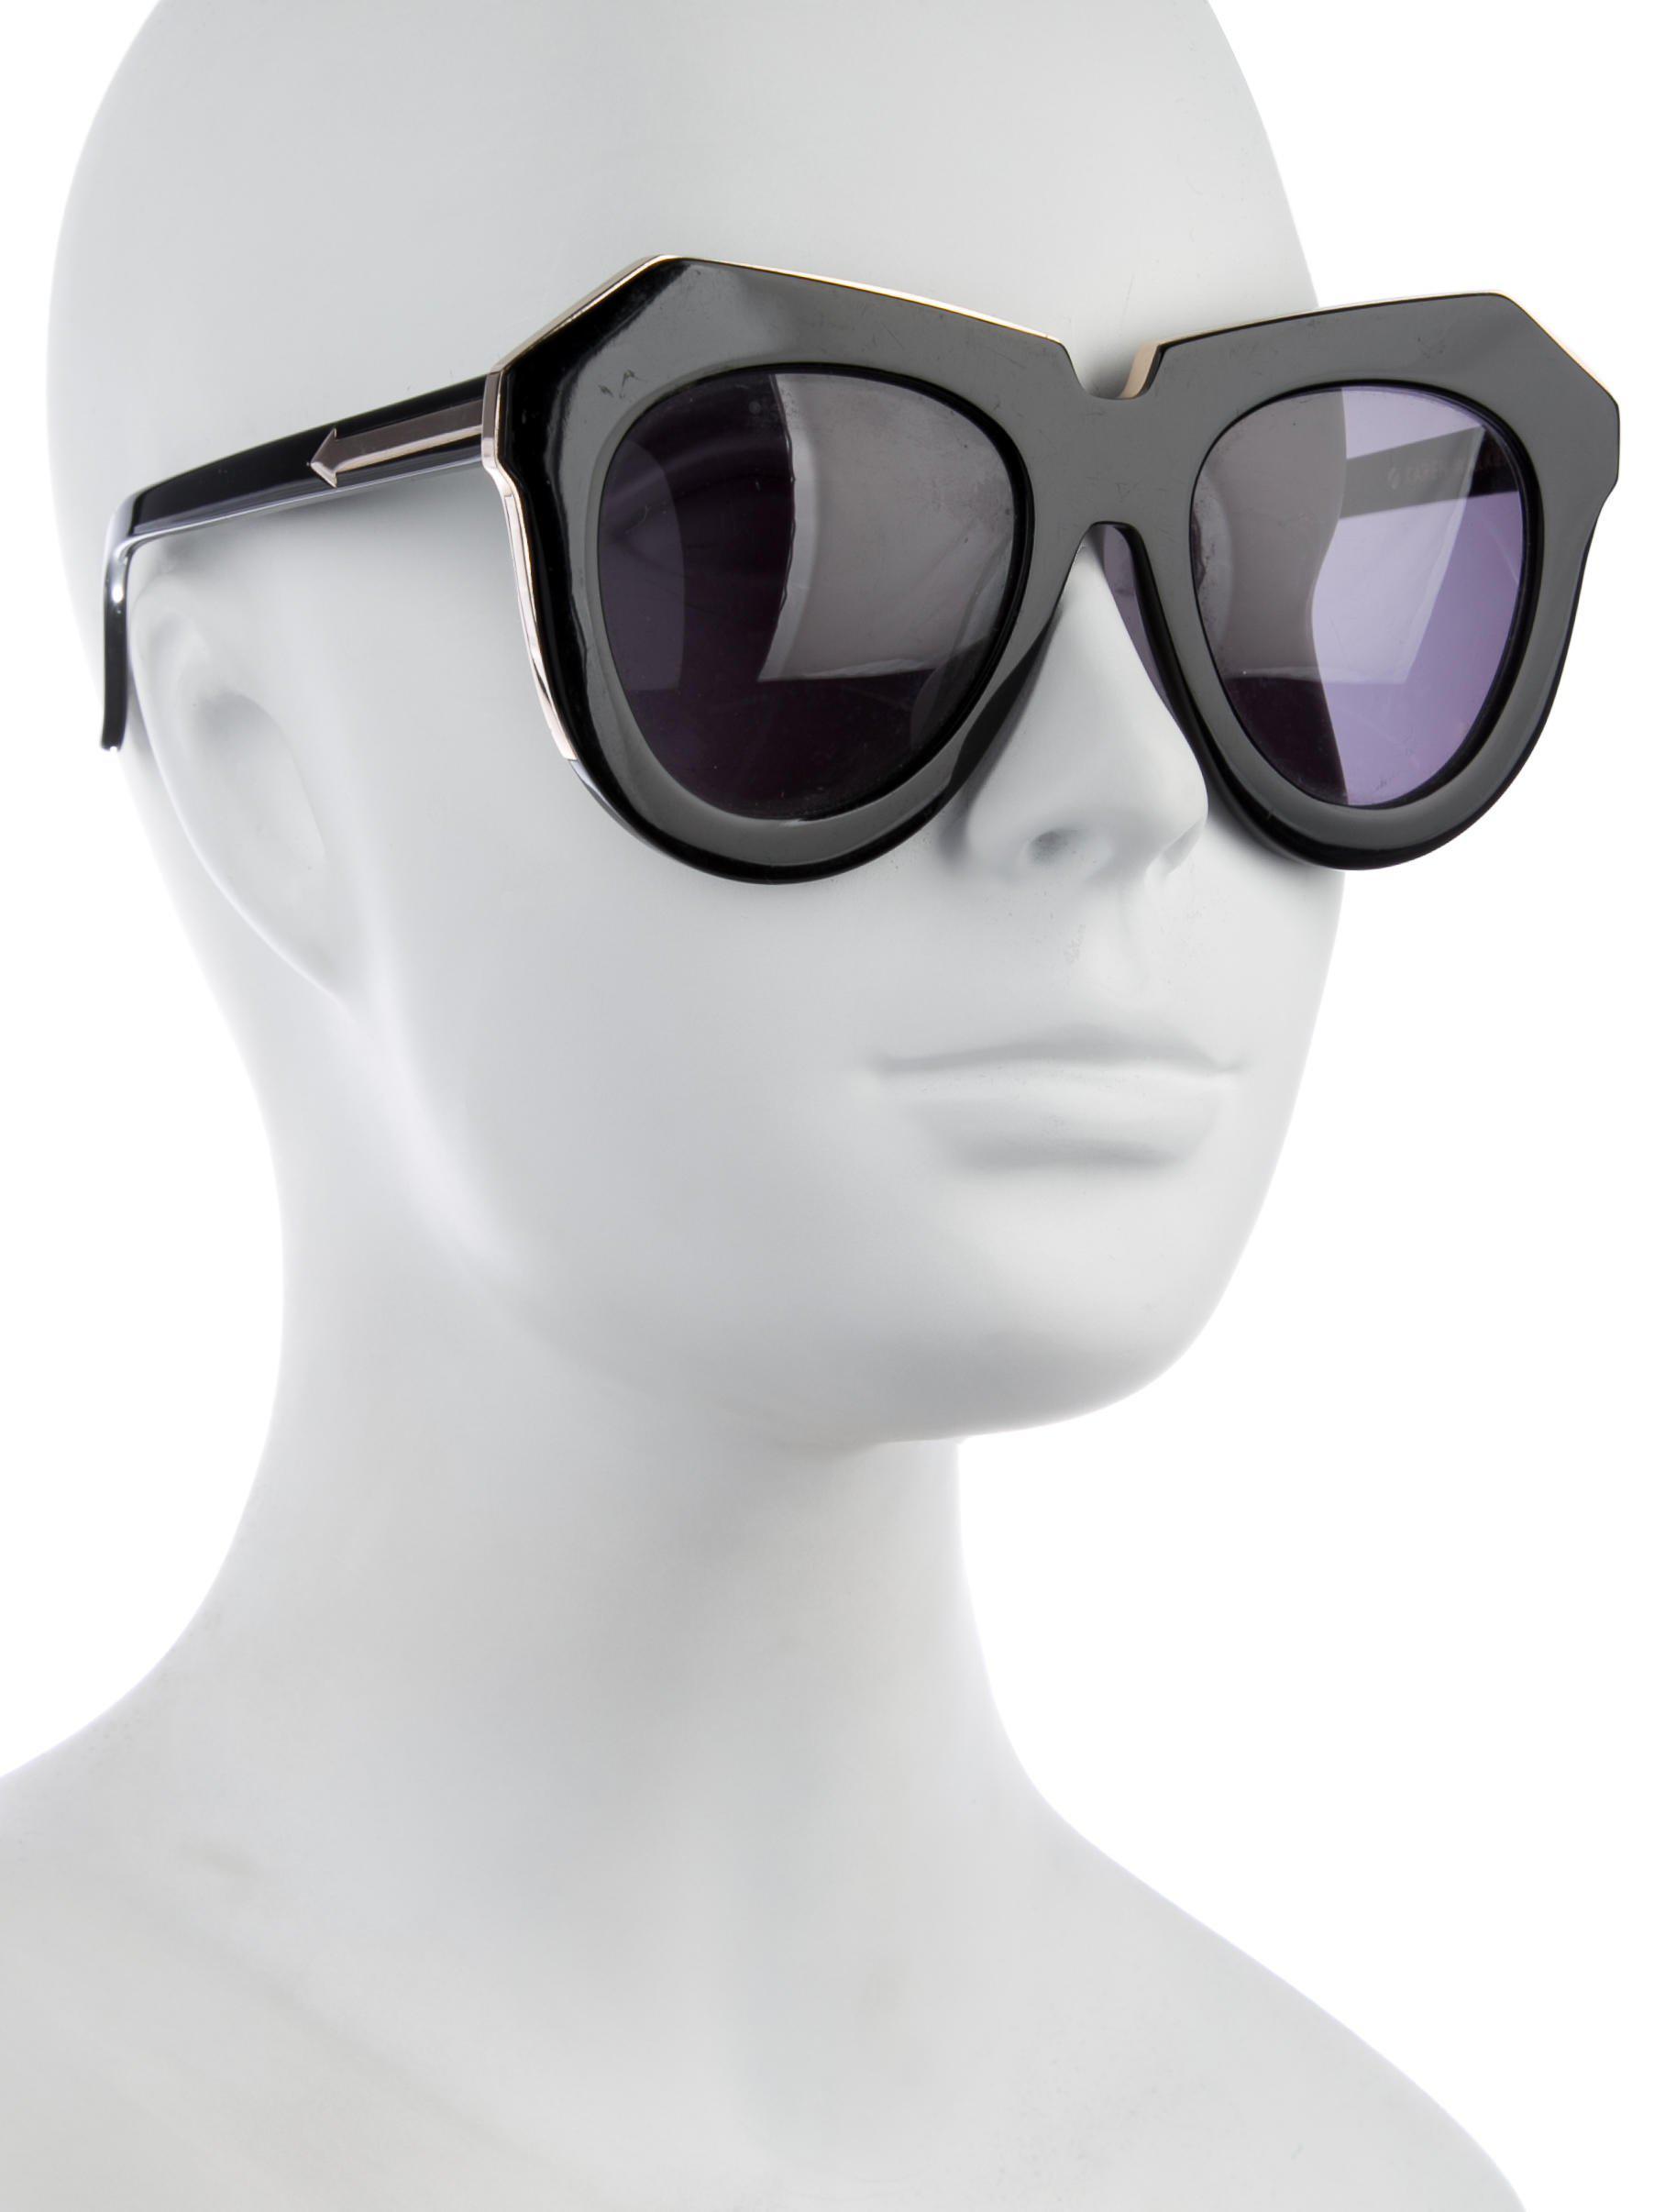 9bb2489bbb9c Lyst - Karen Walker One Meadow Tinted Sunglasses Black in Metallic